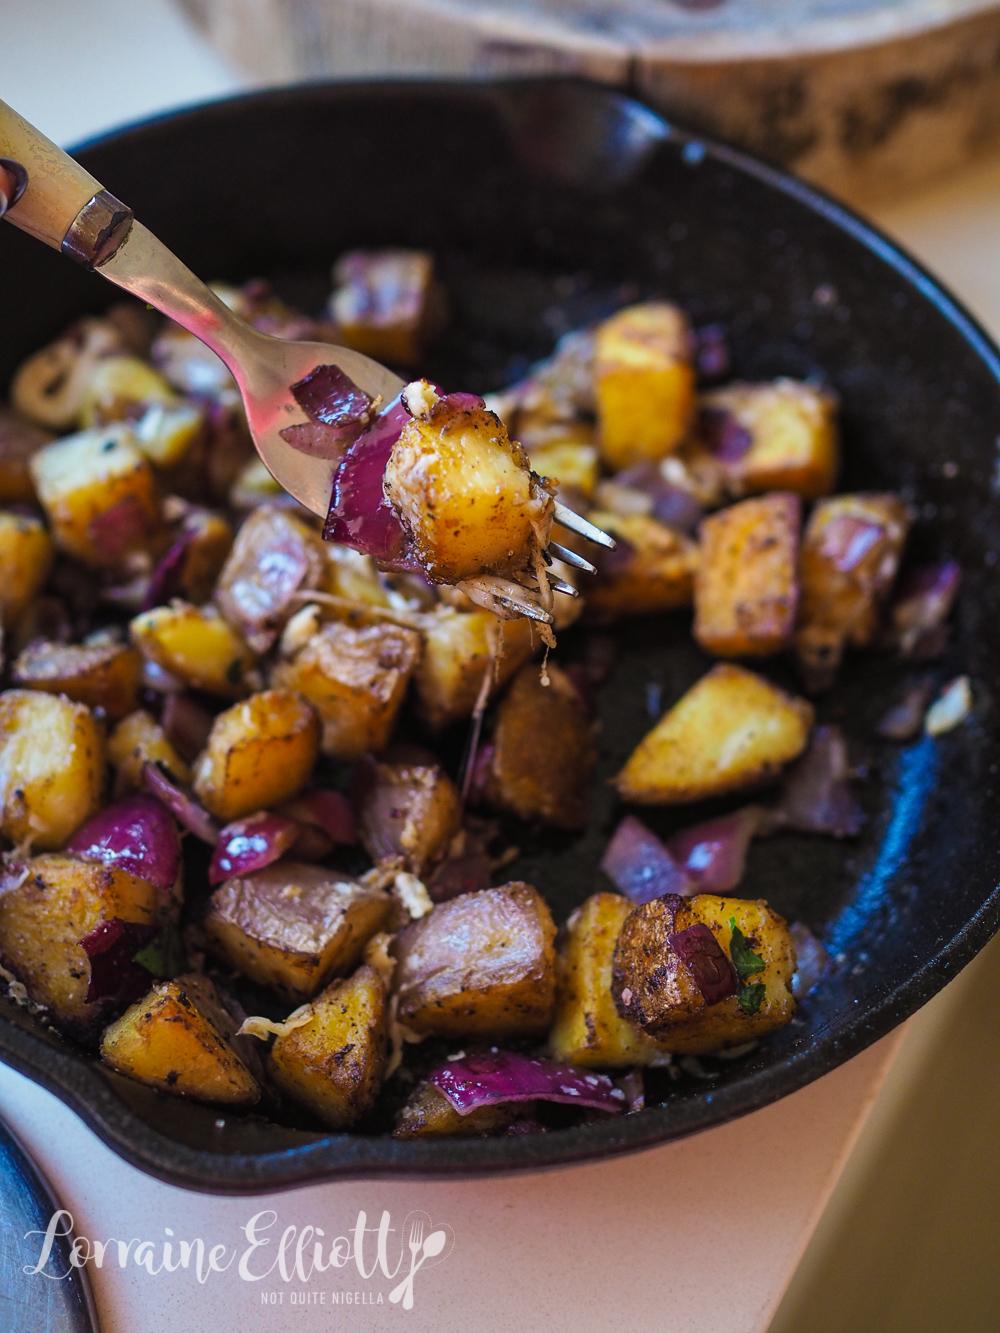 Crispy Home Fries With Garlic & Parmesan